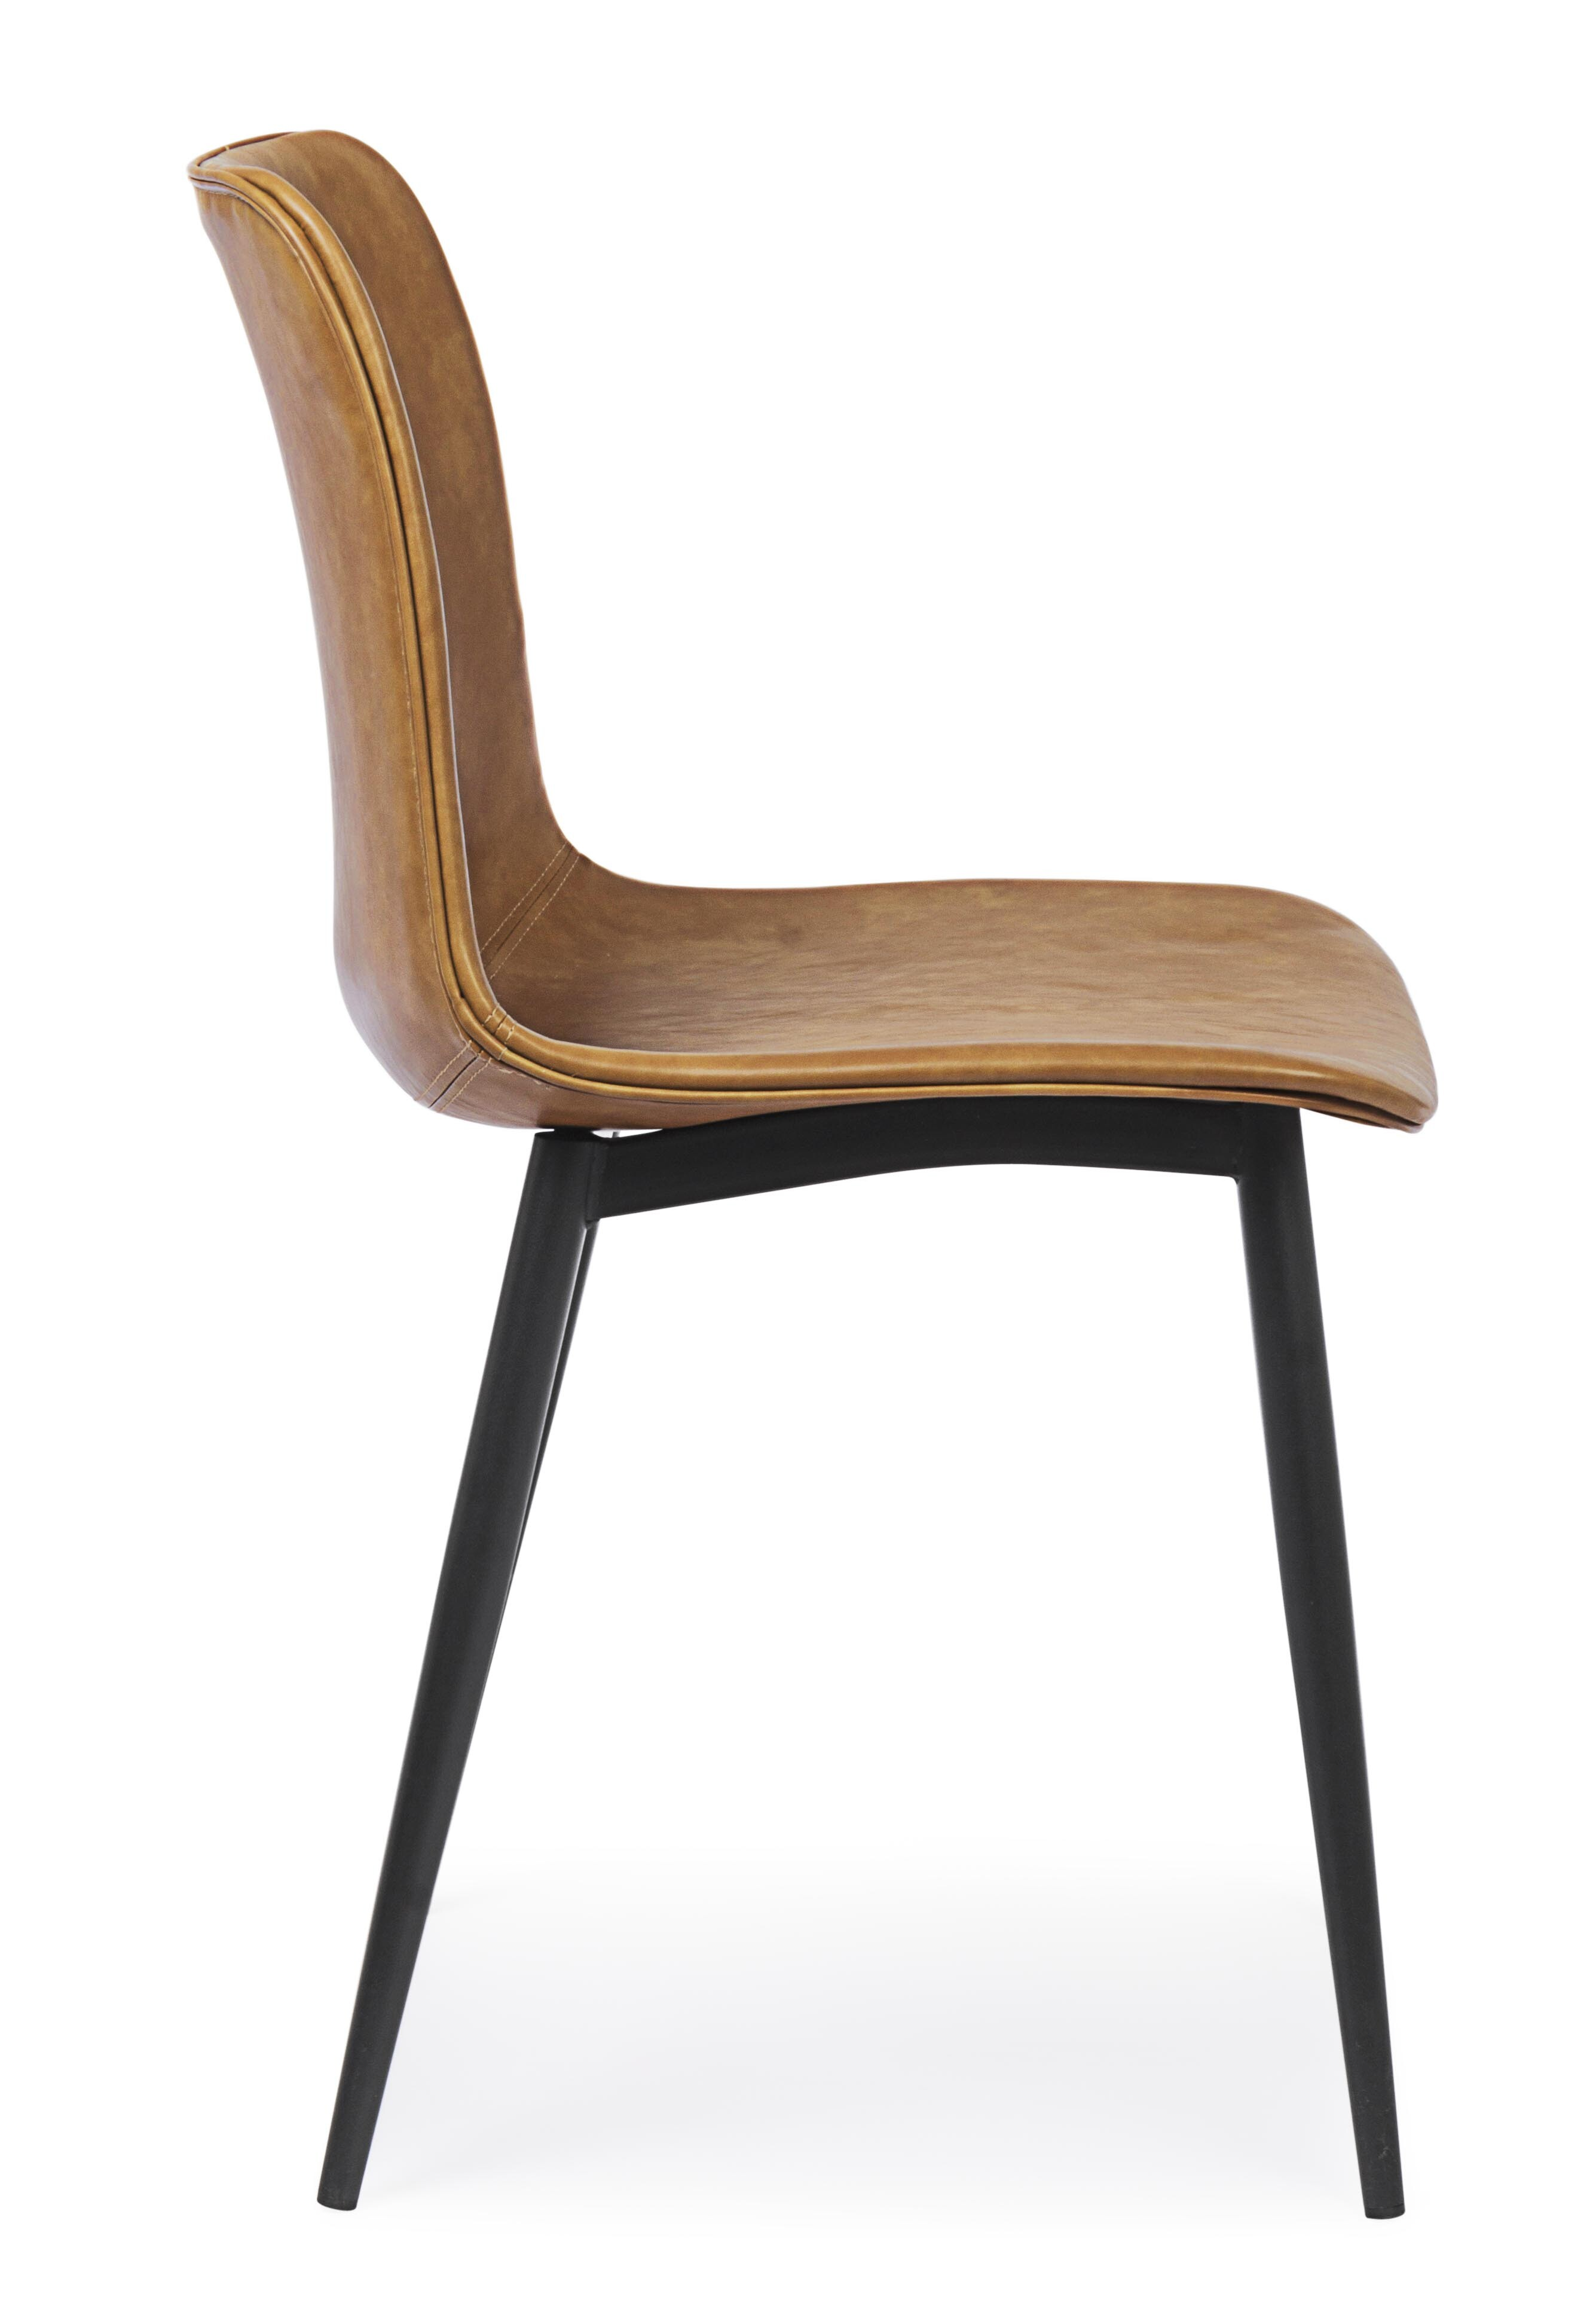 6 Stühle Kyra Pu  06